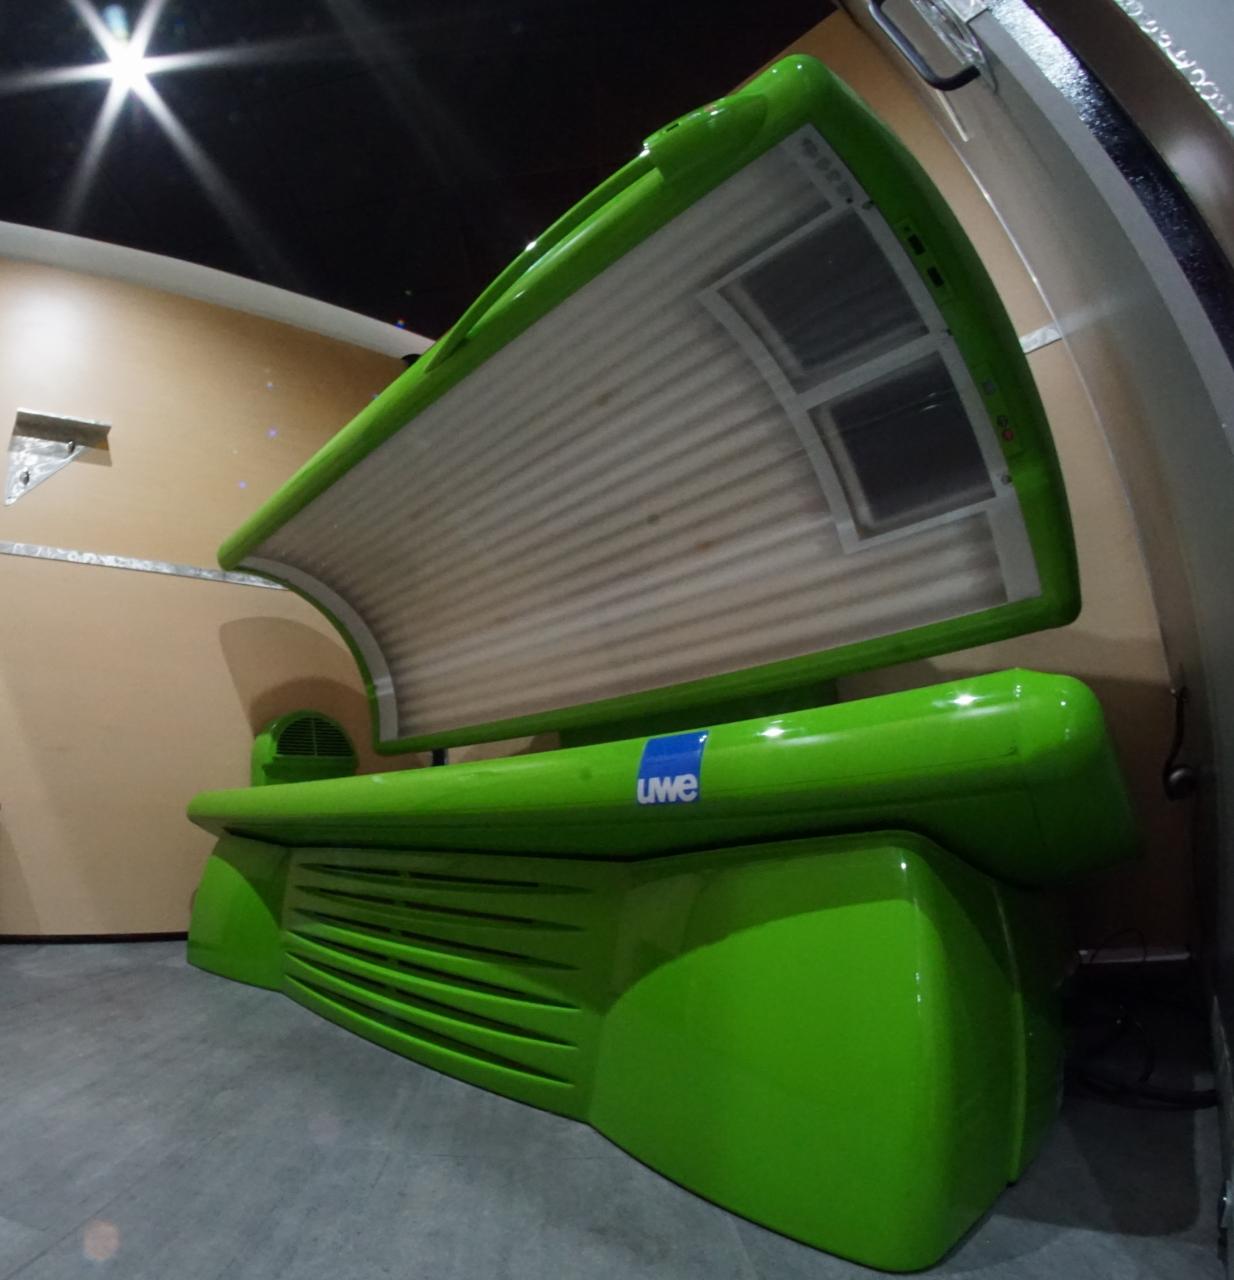 Uwe Tropical Series 32 Gb Tanning Bed Wiring Prev